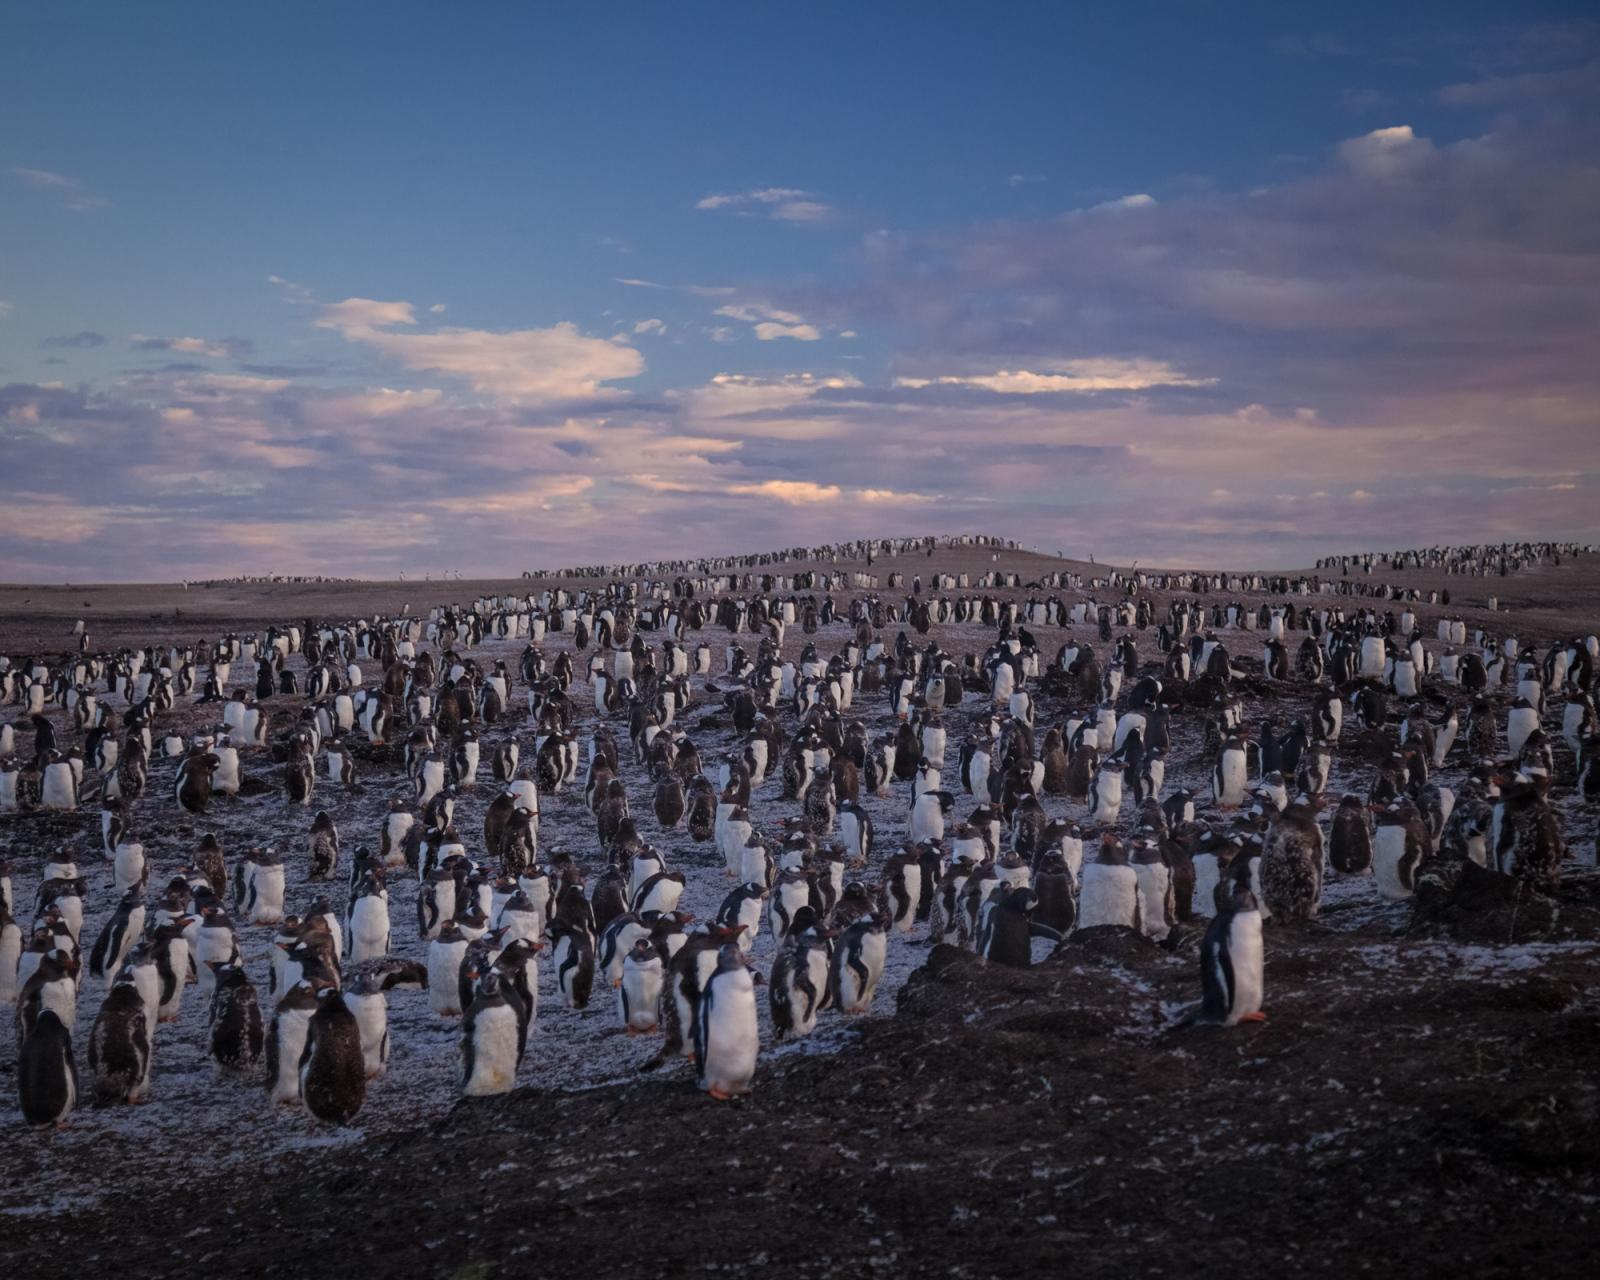 Sunrise over a colony of gentoo penguins on Saunders Island, Falkland Islands.